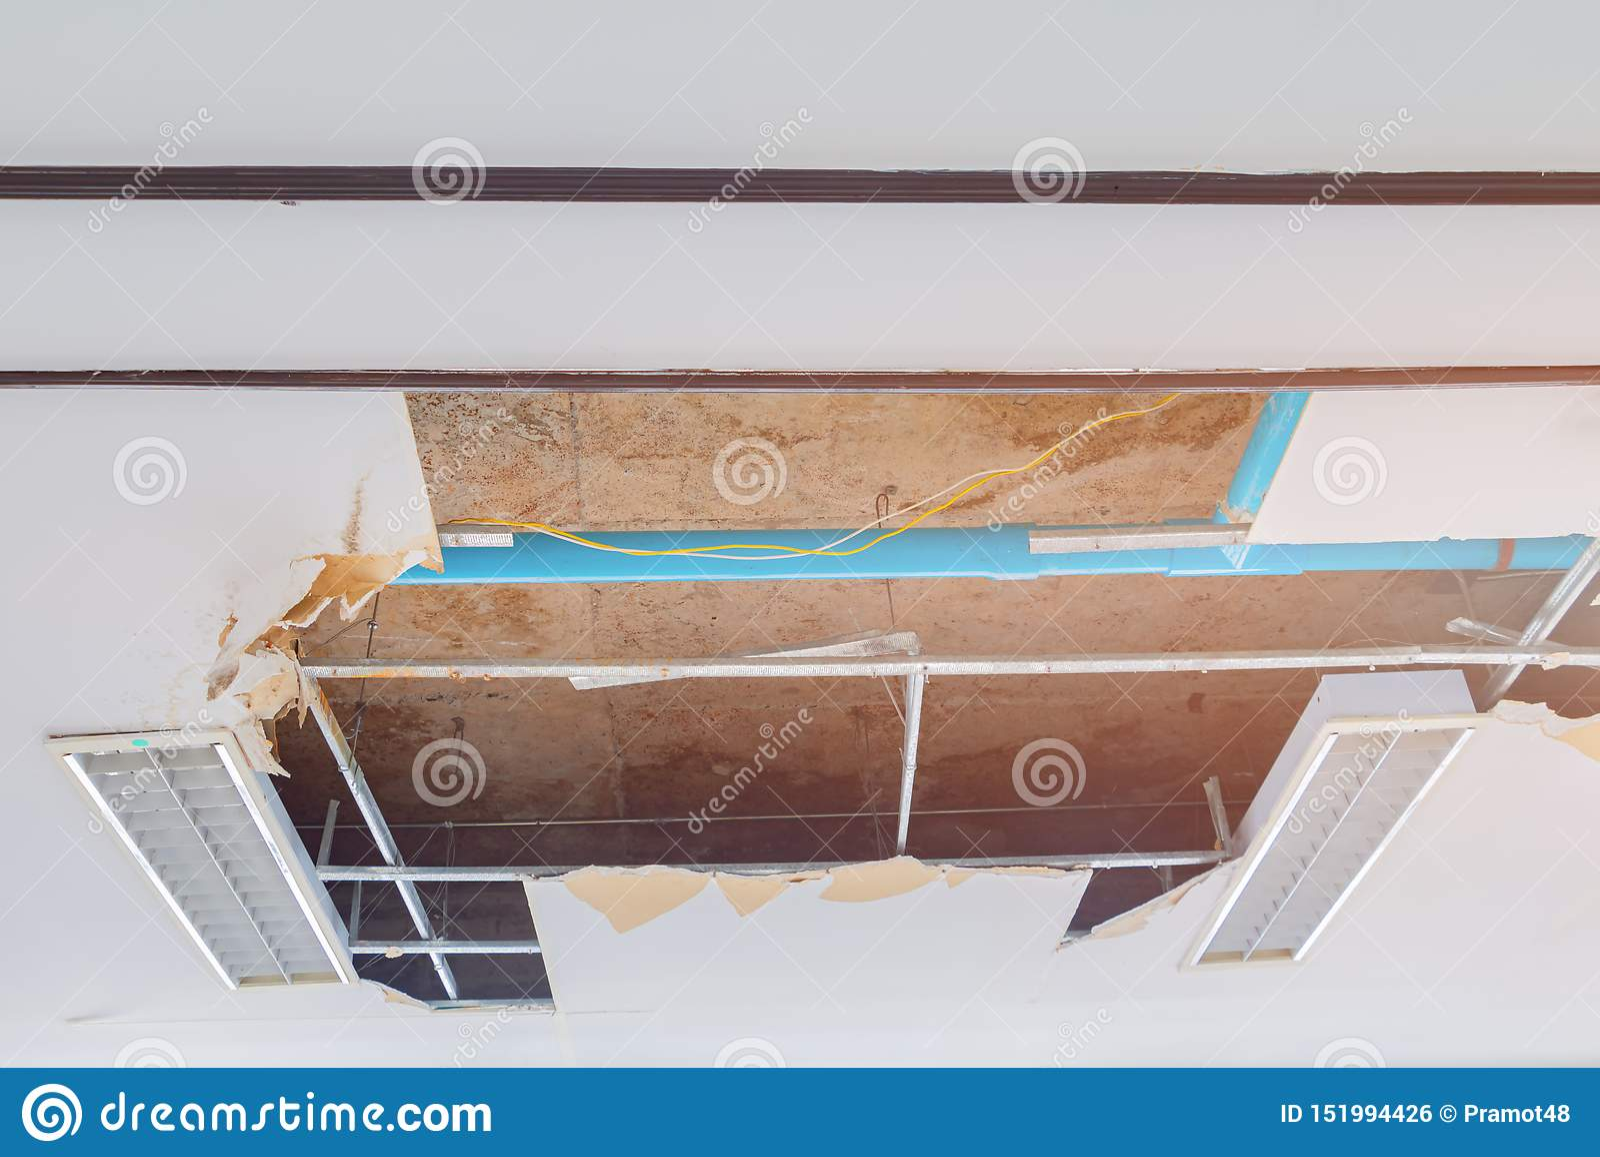 Repair Leak Water Pipe In Under Gypsum Ceiling Interior